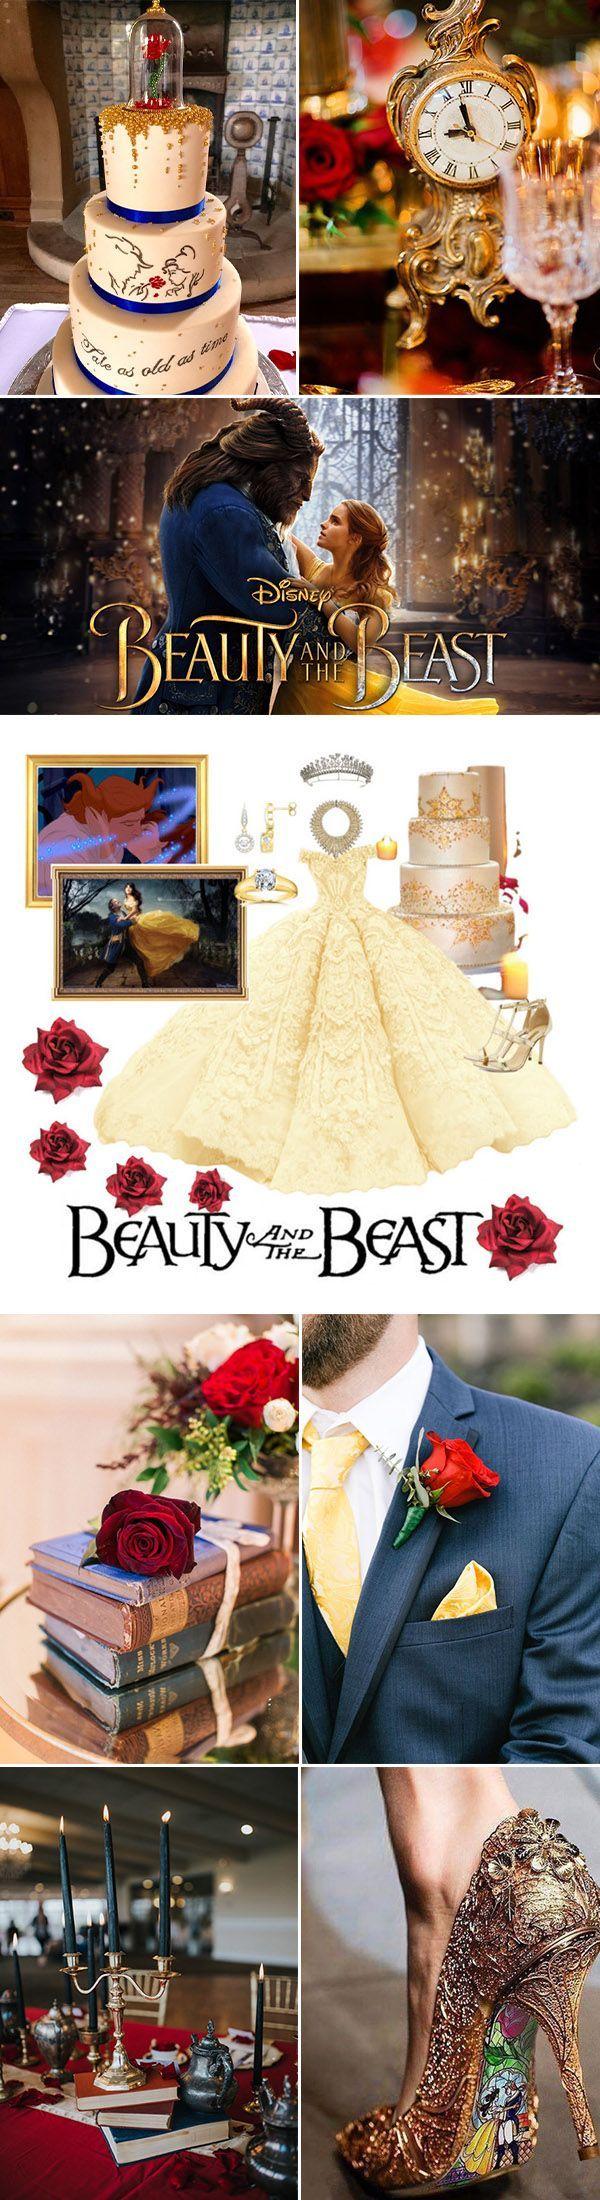 enchanting beauty and the beast disney theme wedding ideas Beauty and The Beast www.pinterest.com/laurenweds/theme-weddings?utm_content=buffer22de7&utm_medium=social&utm_source=pinterest.com&utm_campaign=buffer